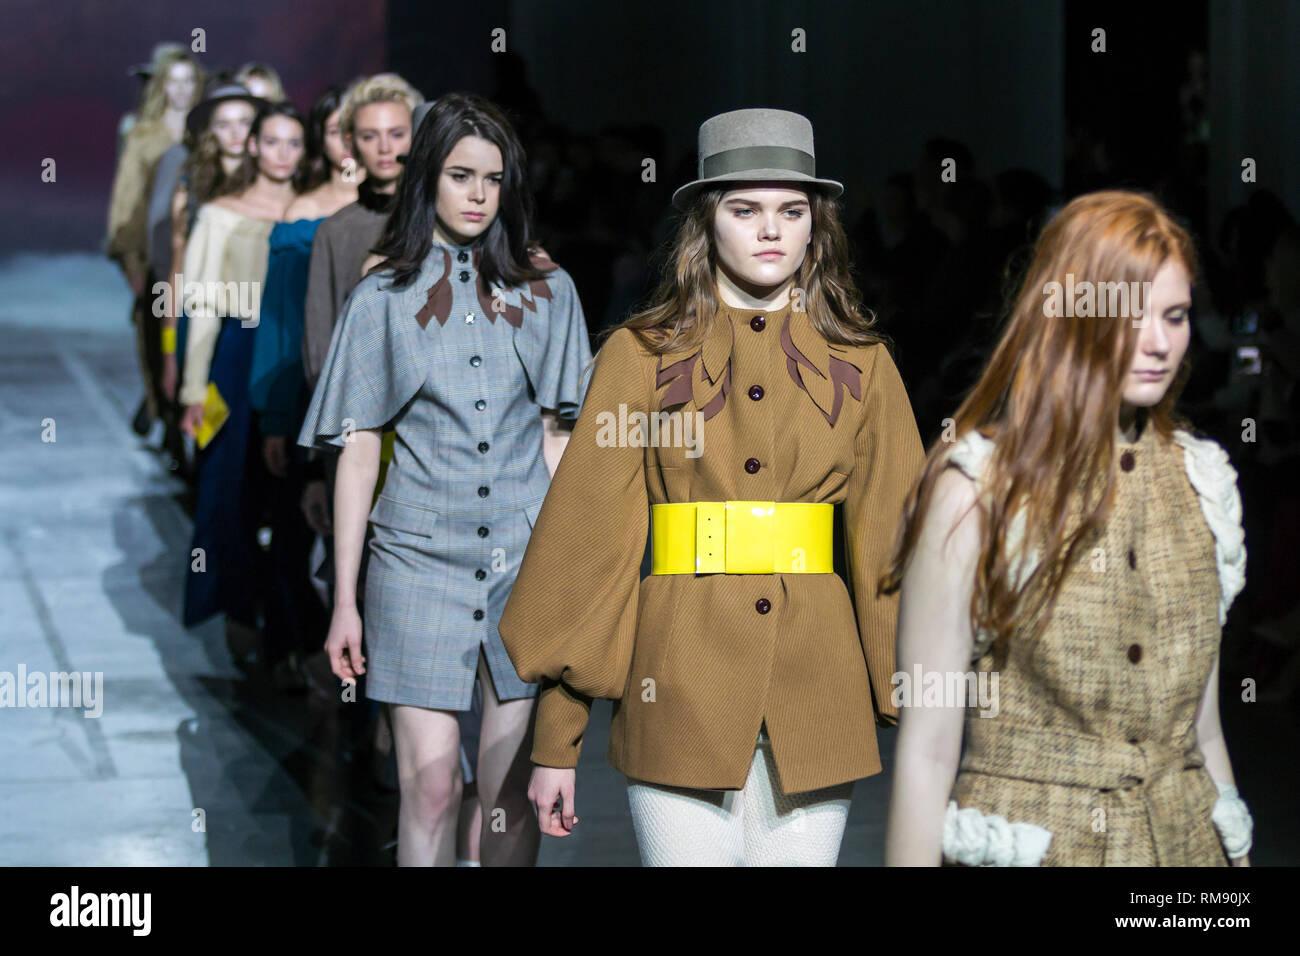 ba4e8940d0a KYIV, UKRAINE - FEBRUARY 4, 2019: KATERINA RUTMAN collection show during Ukrainian  Fashion Week 19-20 at Mystetsky Arsenal in Kyiv